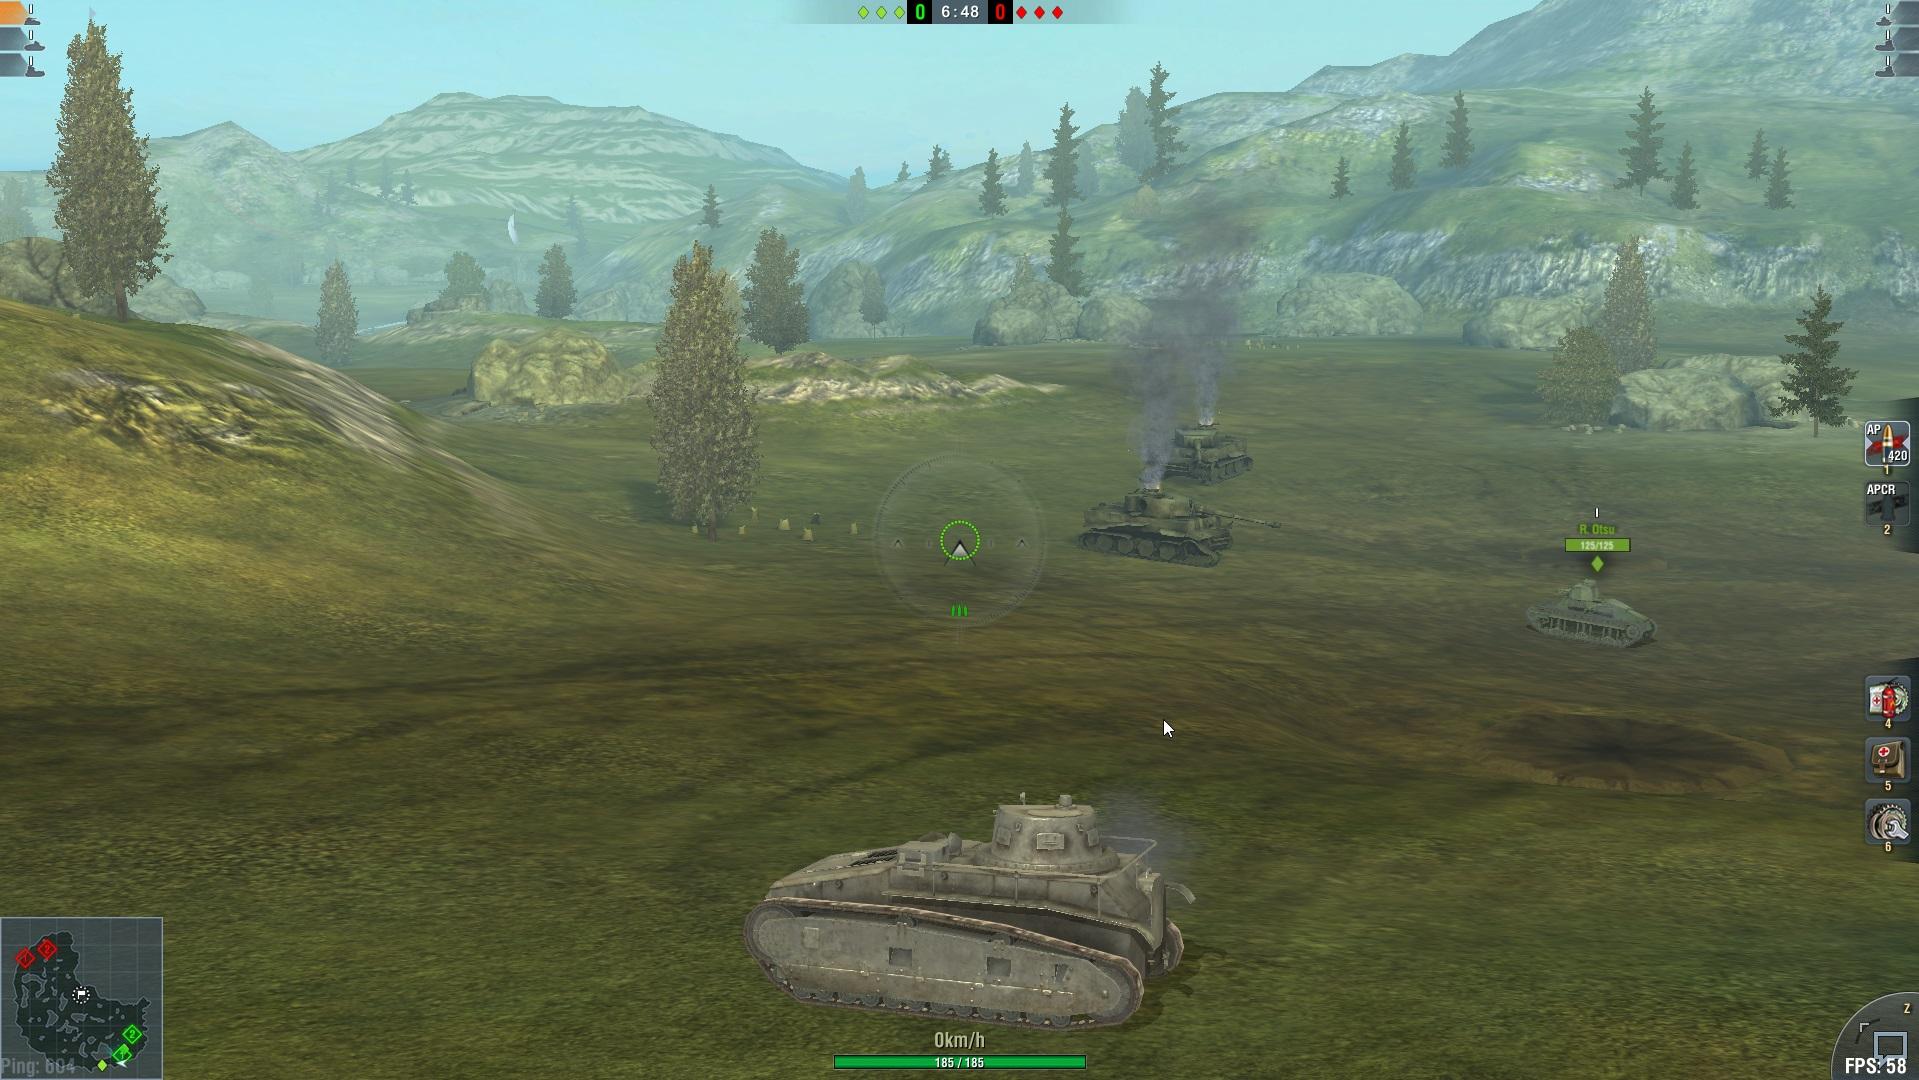 world of tanks how to make mini map b9igger